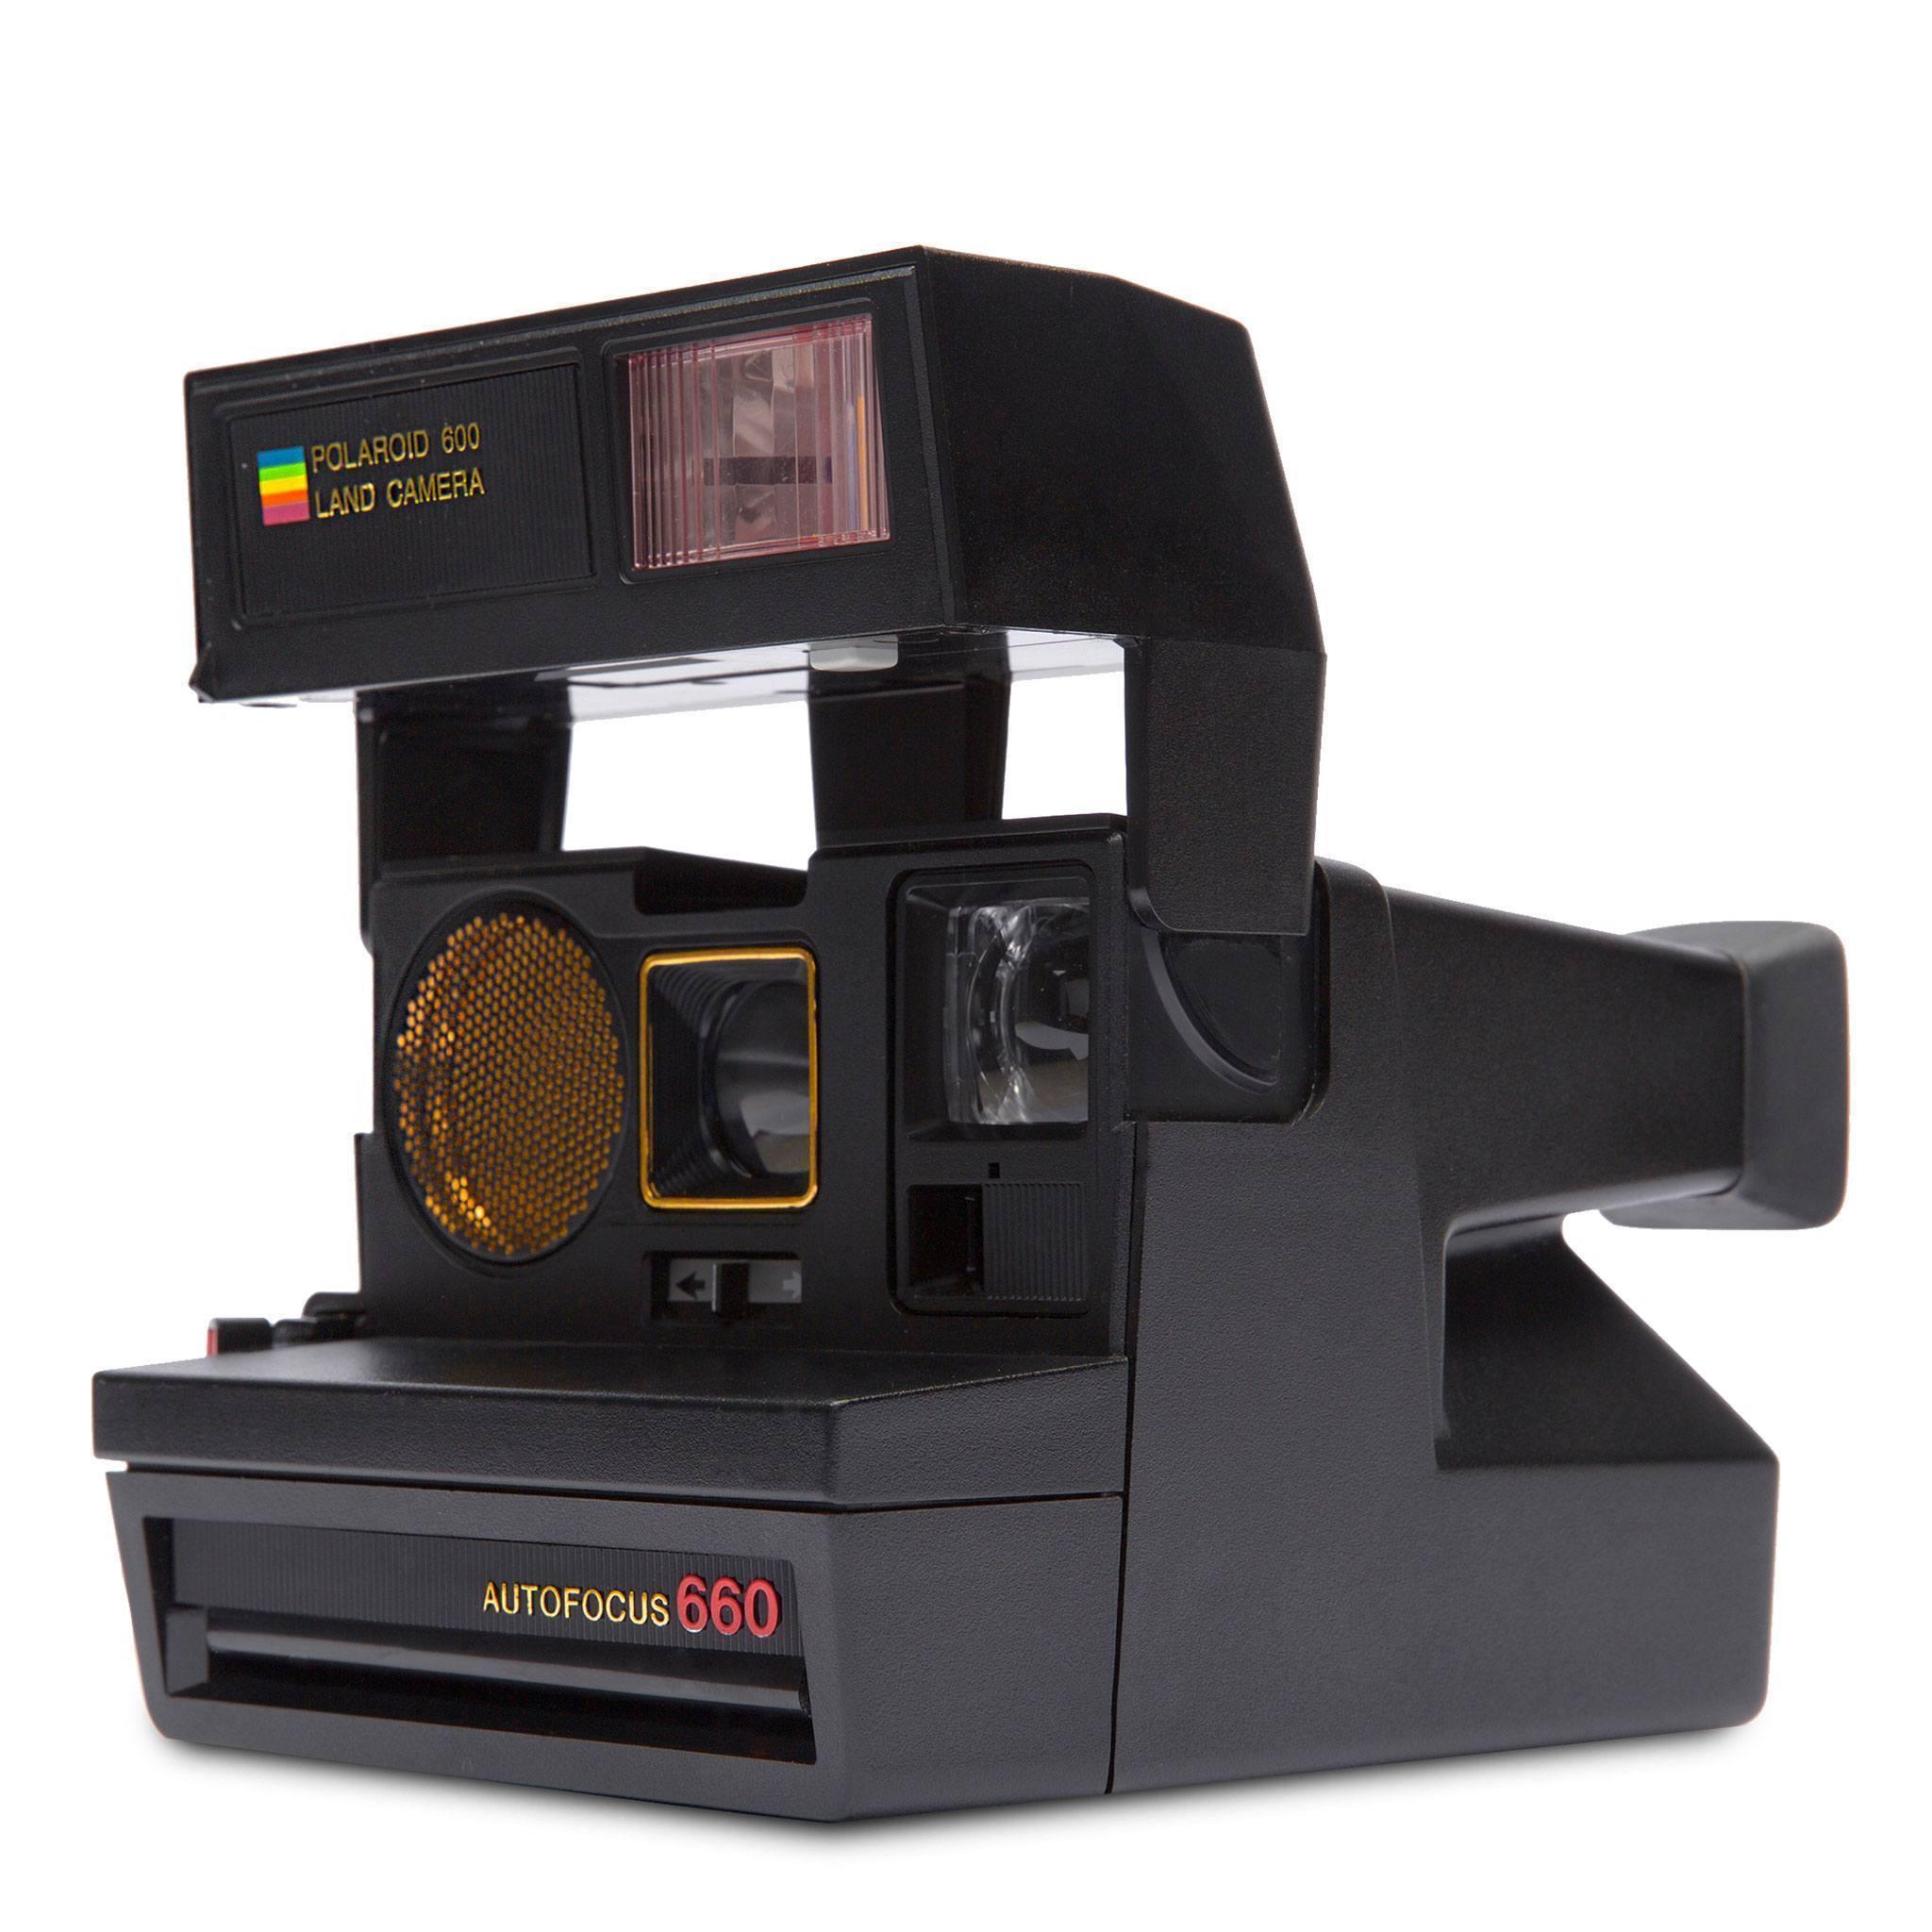 polaroid-600-camera-sun660-autofocus-004792-angle__1_.jpg